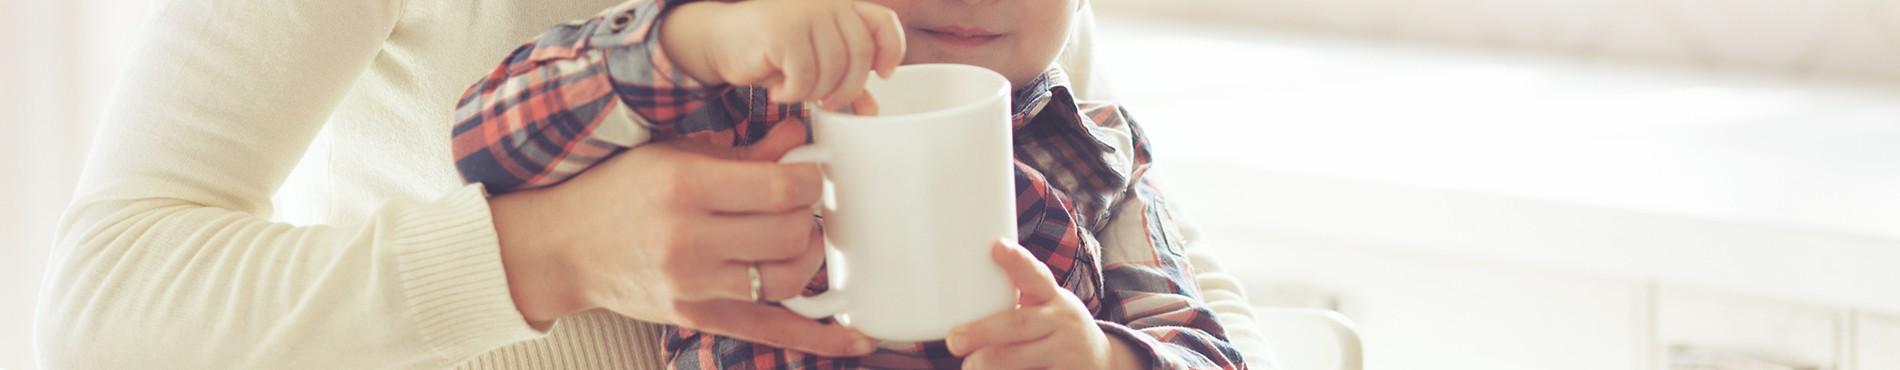 Personnalisez vos mugs en impression quadrichromie